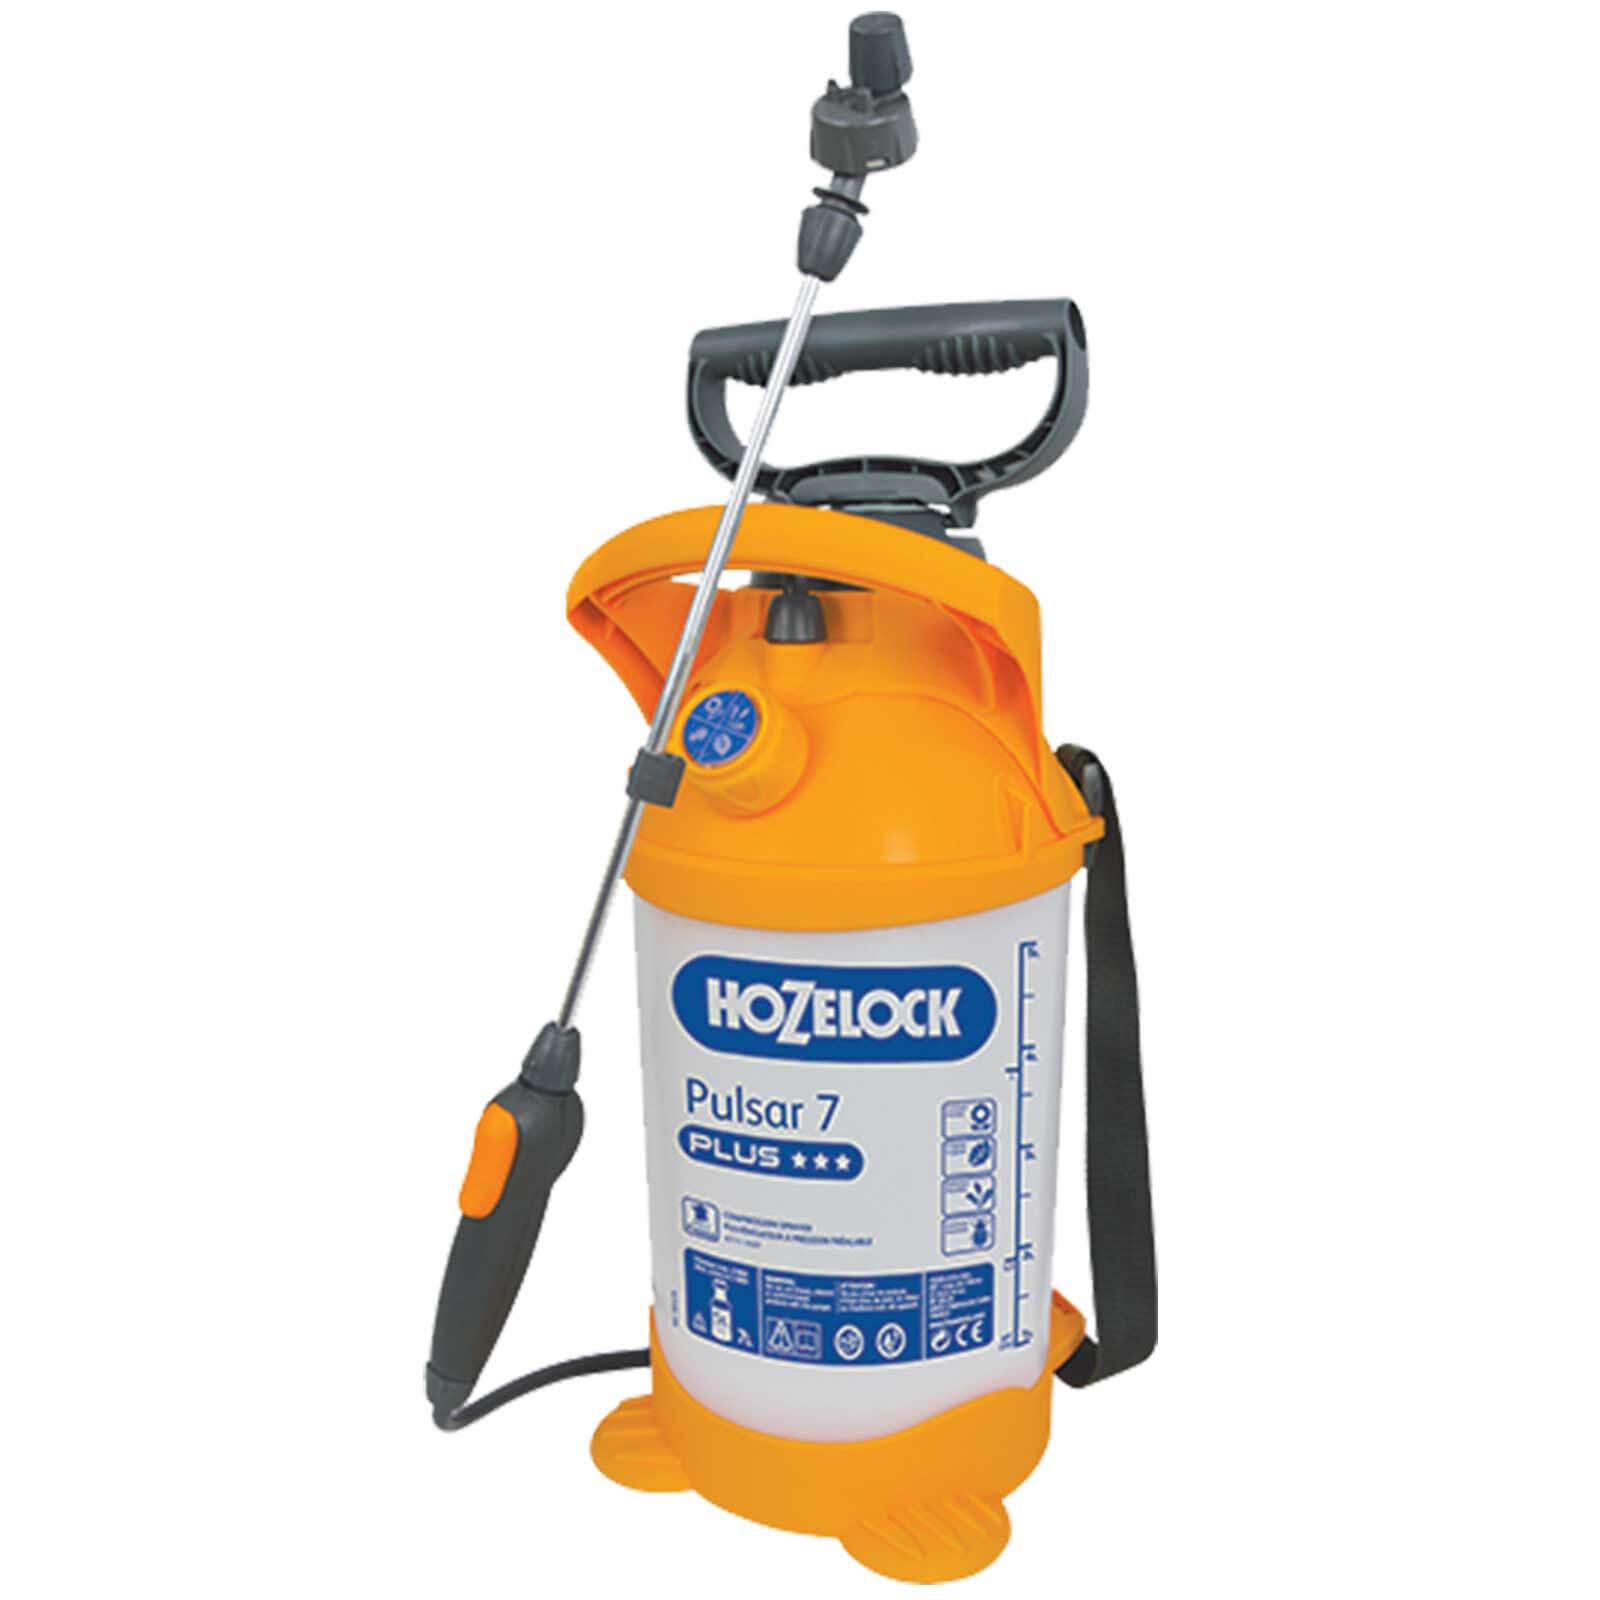 Hozelock PULSAR PLUS Water Pressure Sprayer 7l